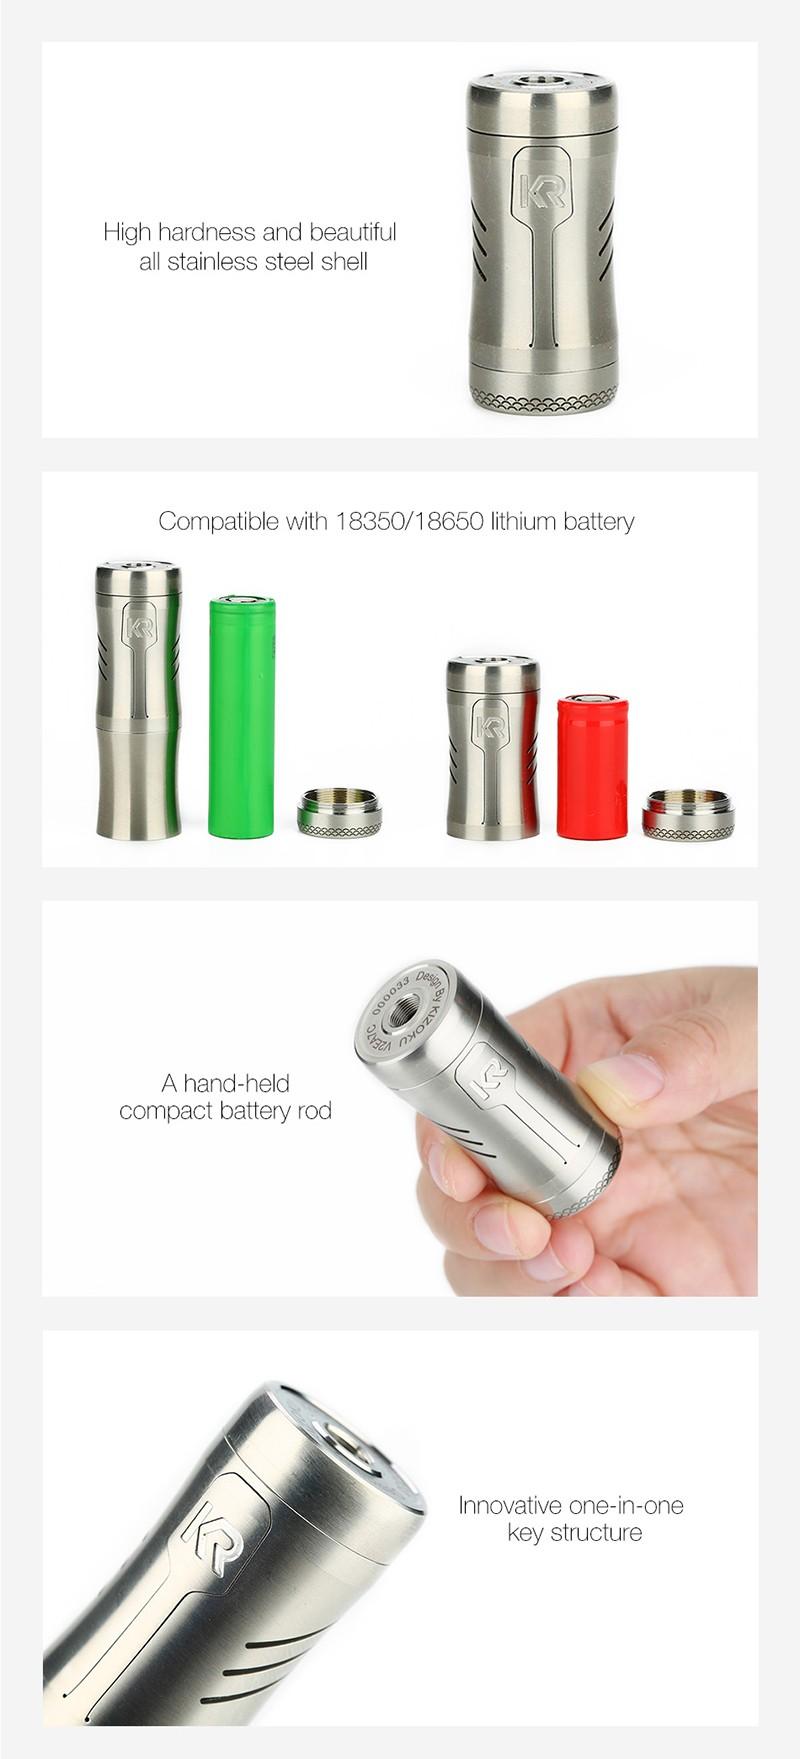 KIZOKU Kirin Semi-Mech Mechanical Tube Vape Mod